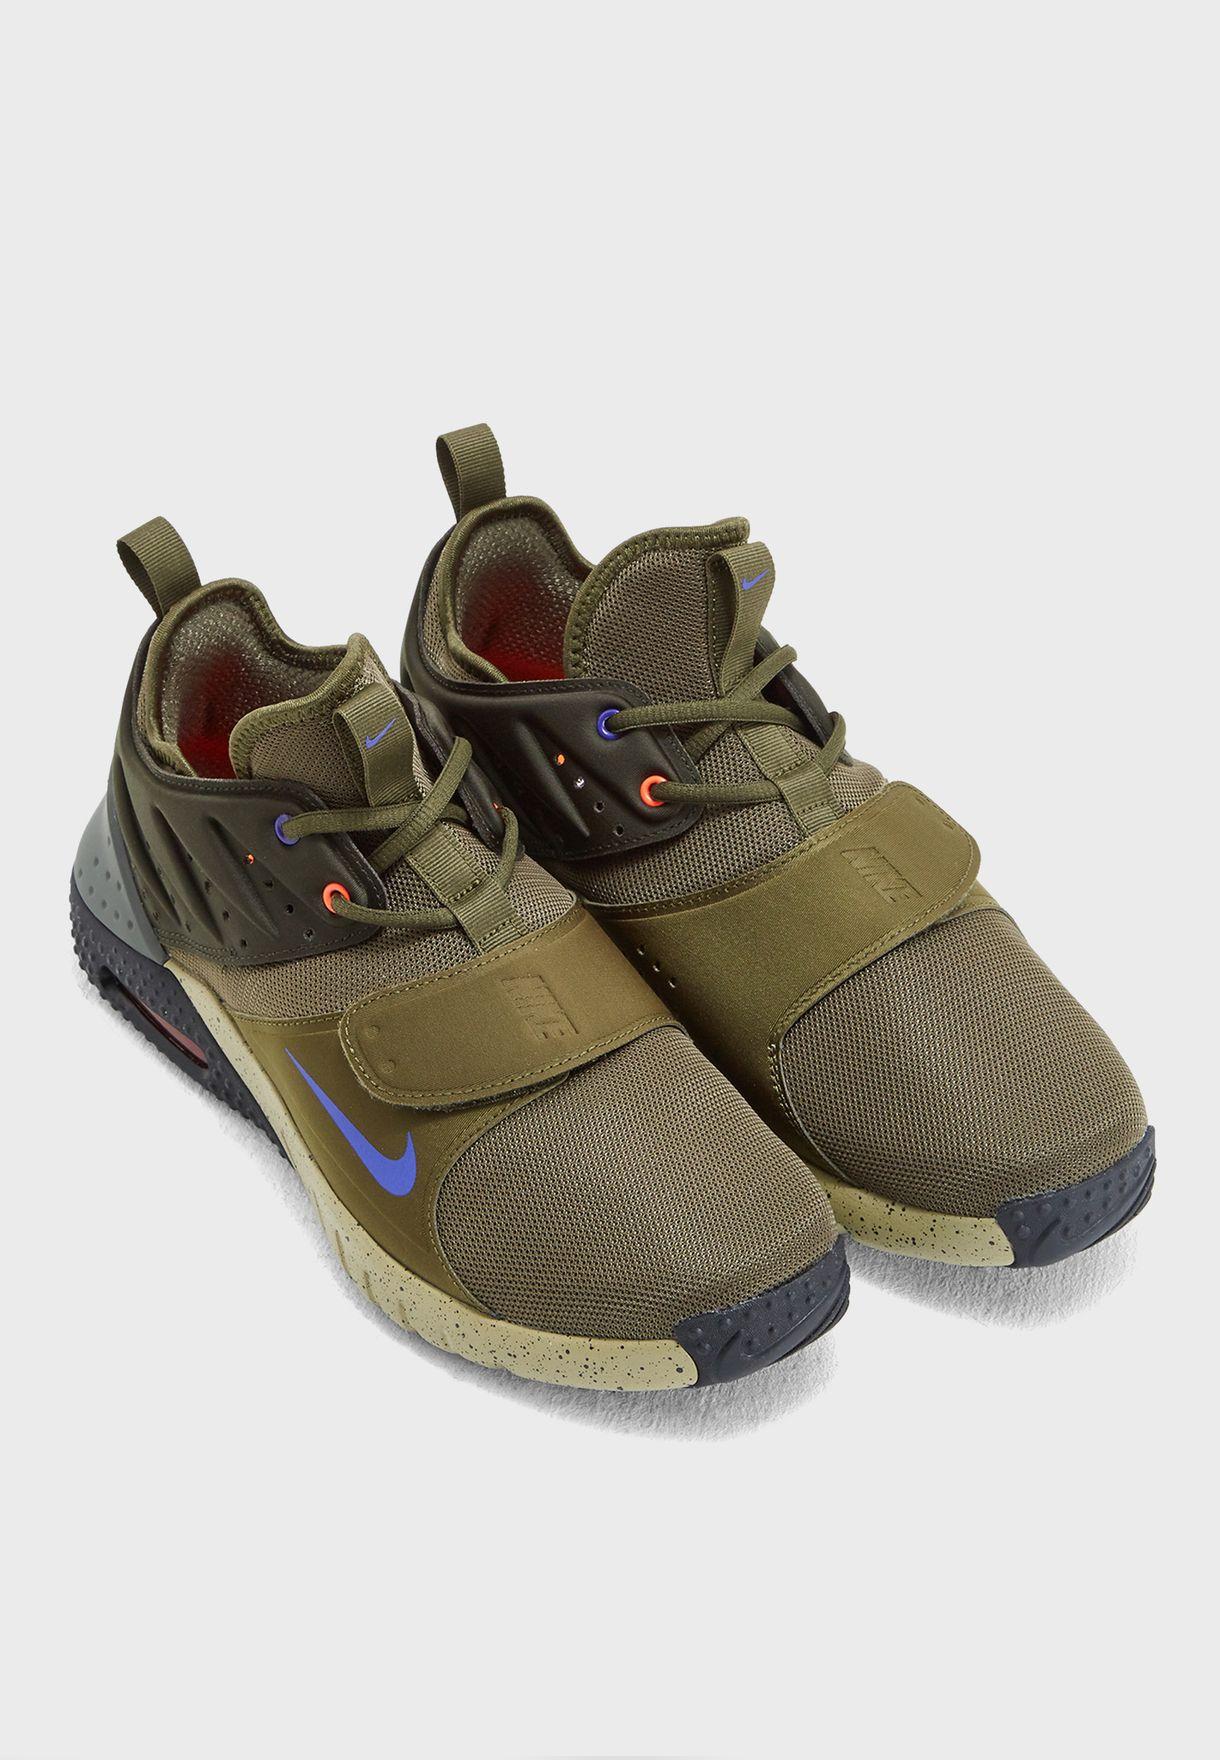 Nike Air Max Trainer 1 in grün AO0835 342 | everysize